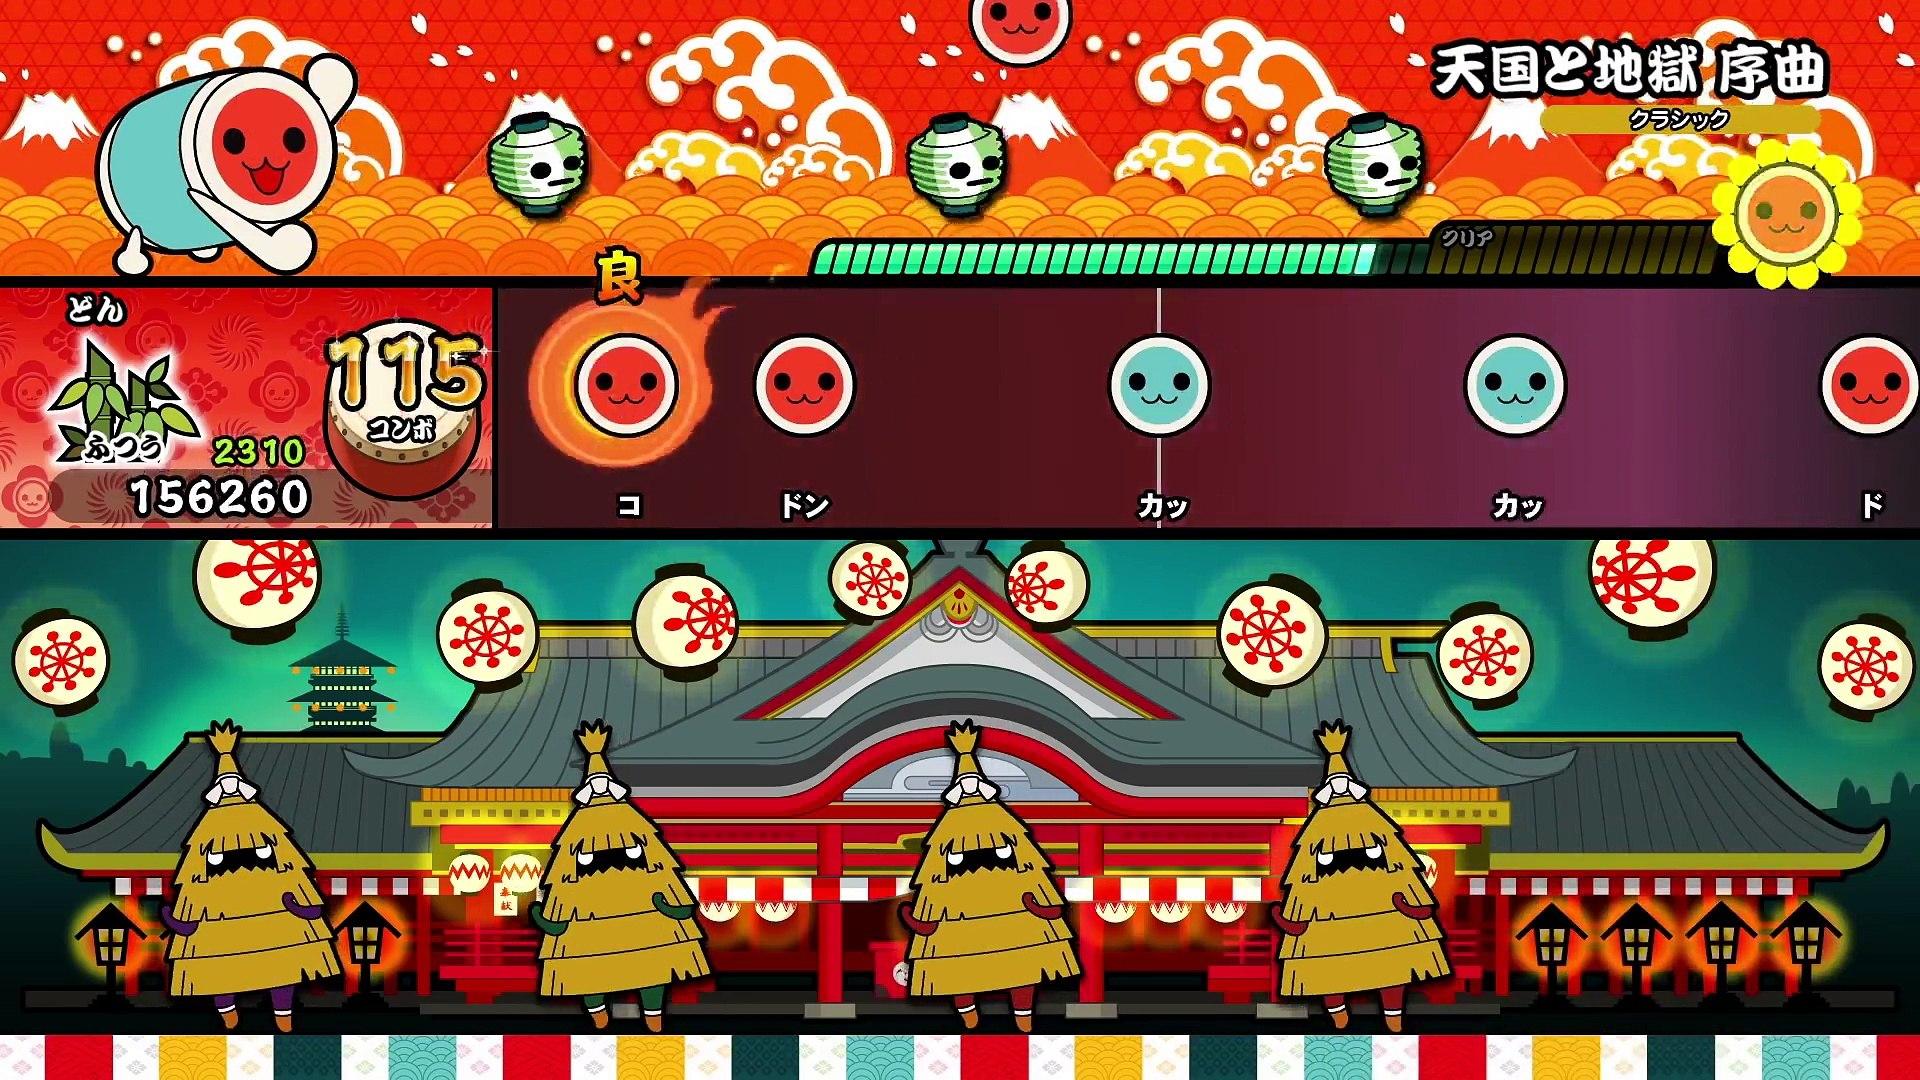 Taiko no Tatsujin Nintendo Switch Version - Annonce Nintendo Direct